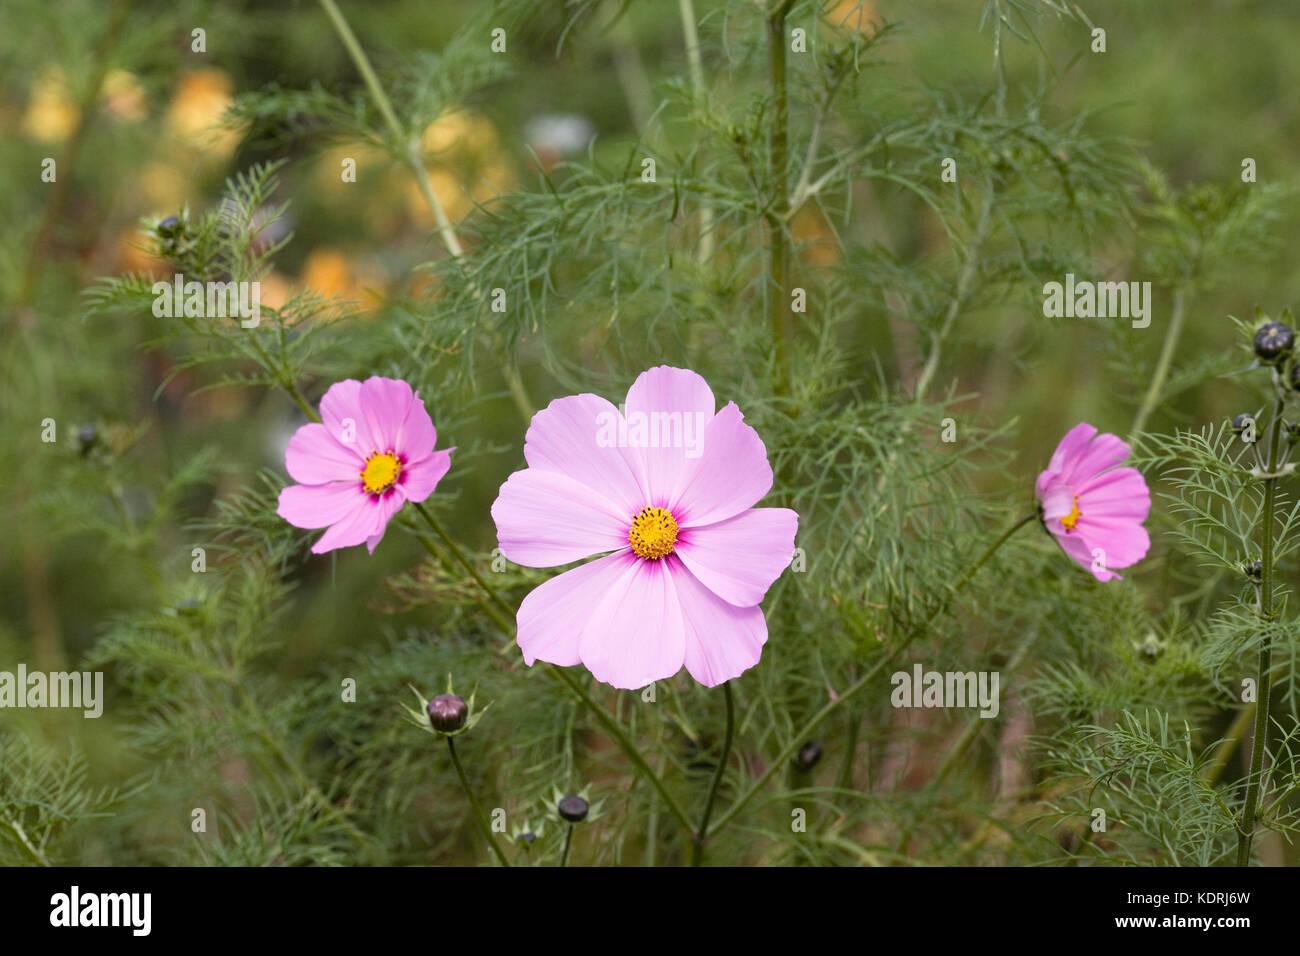 Cosmos bipinnatus flowers in Autumn. - Stock Image